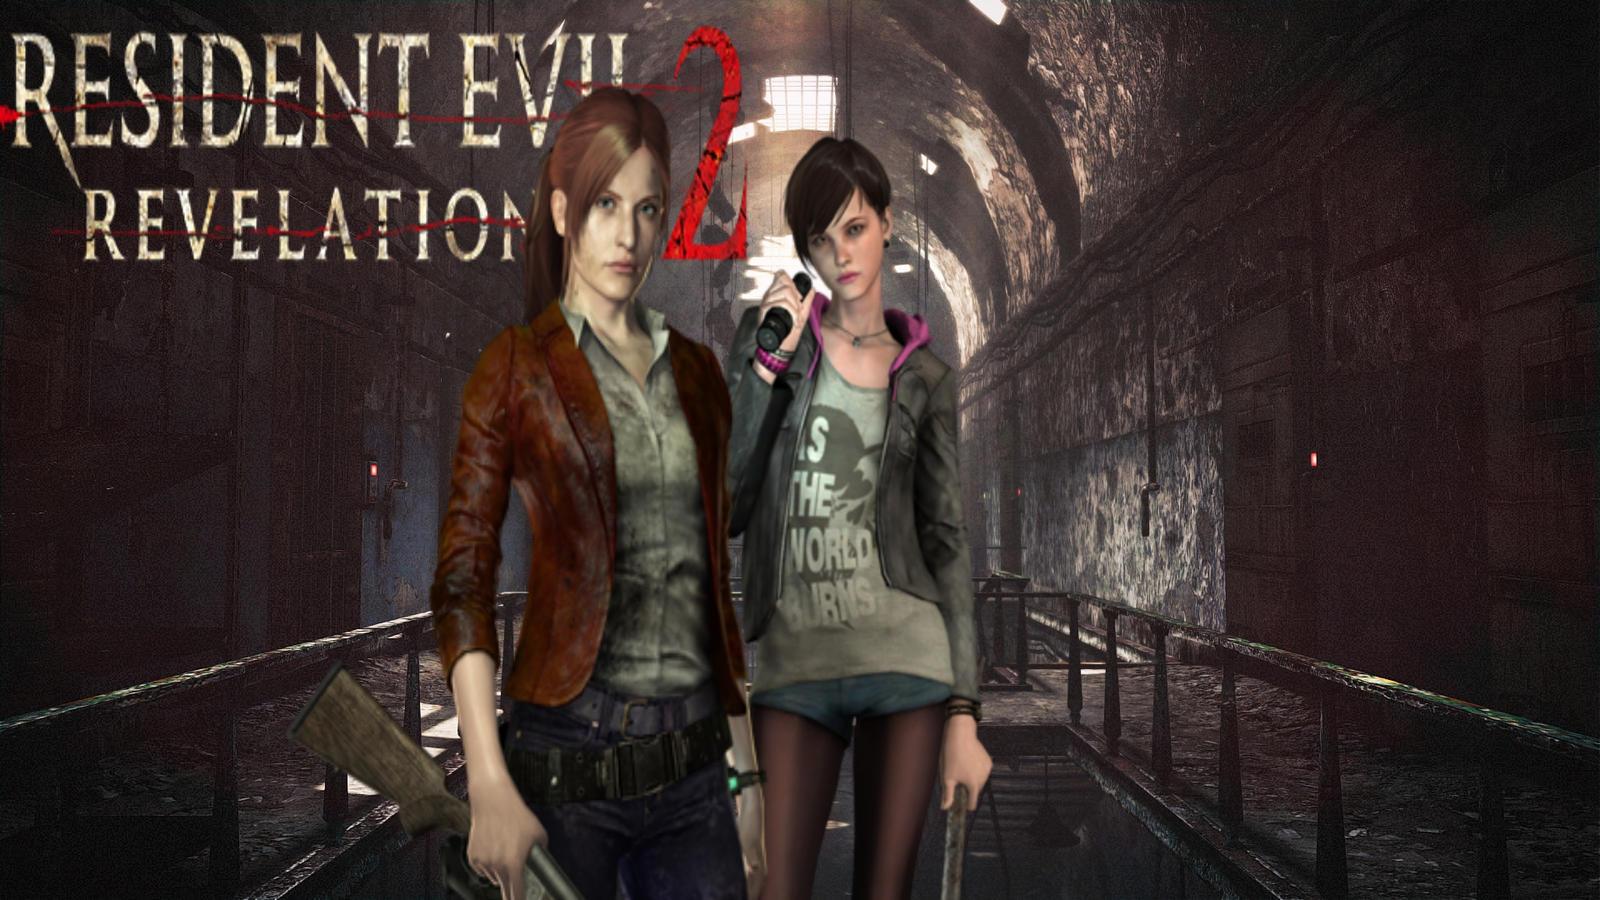 Resident Evil Revelations 2 Wallpaper 3 By Xzombiealix On Deviantart